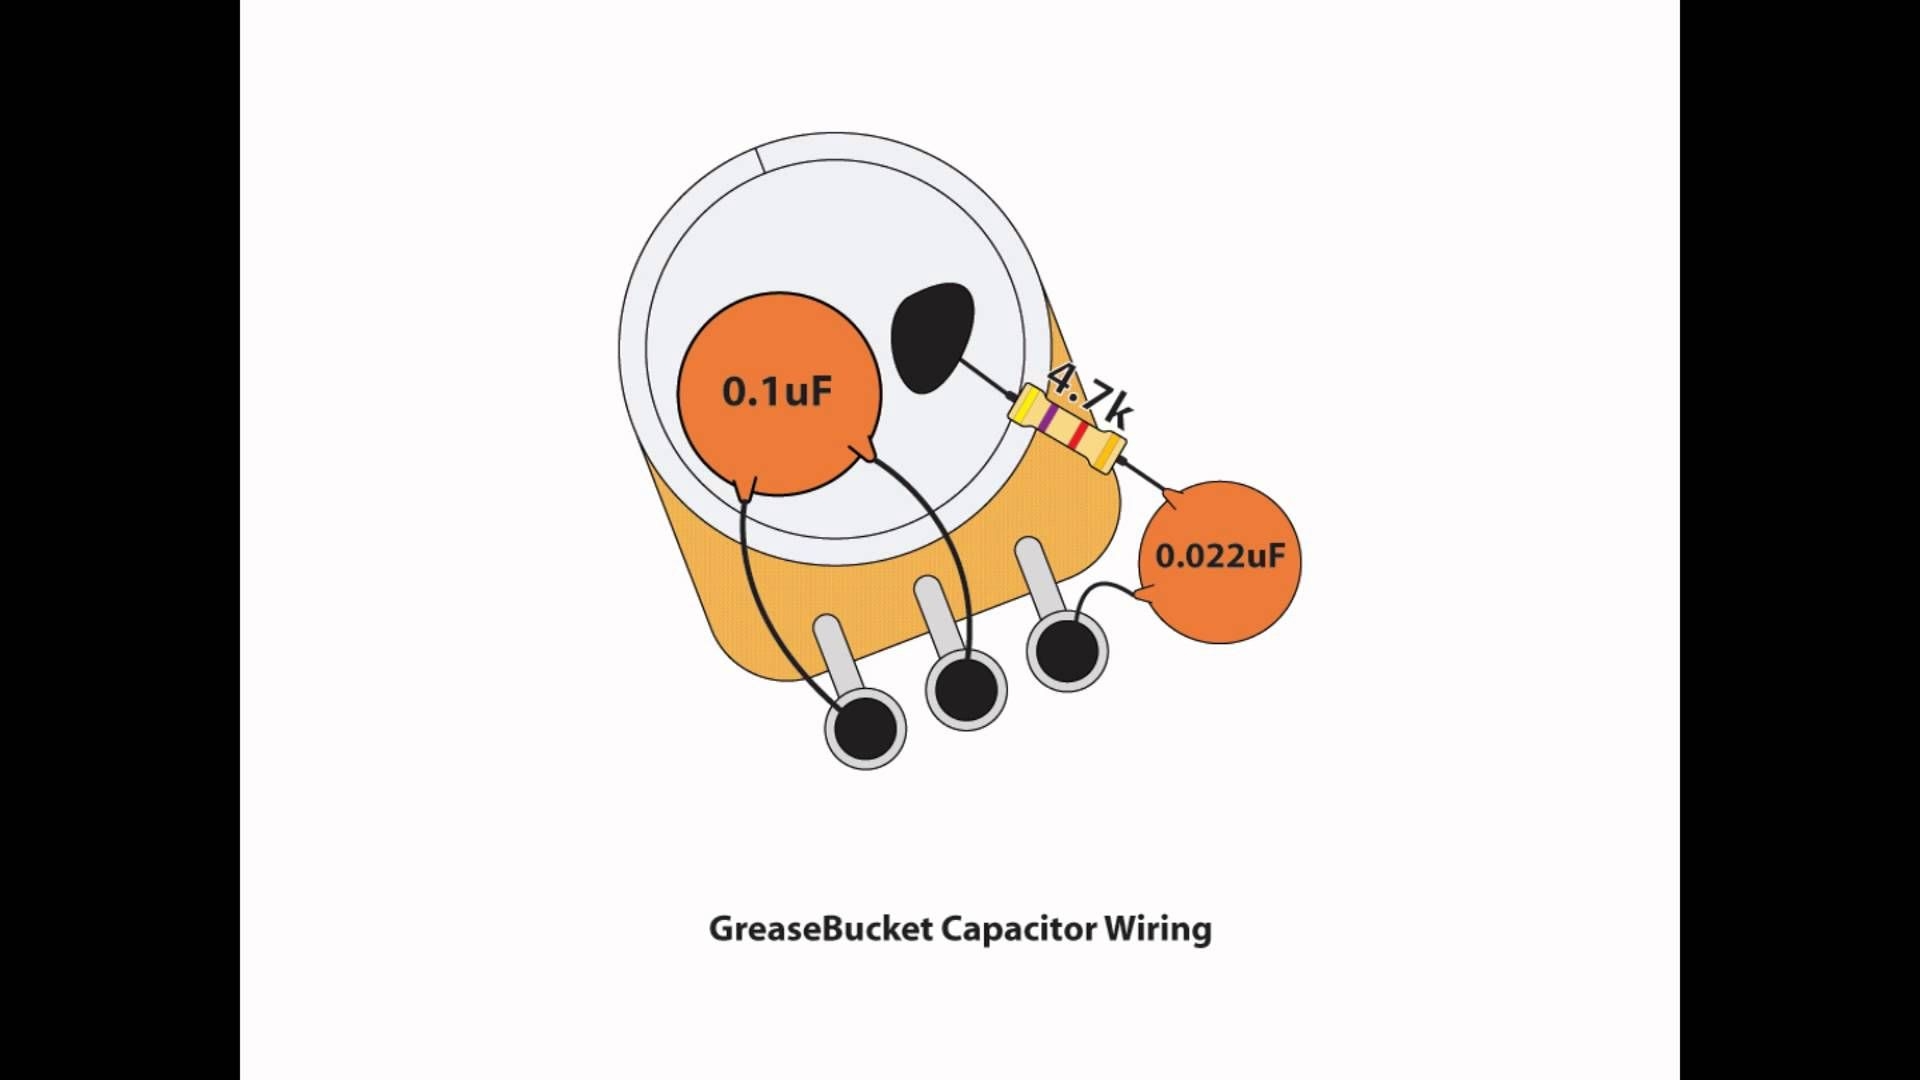 stratocaster greasebucket wiring mod diy  [ 1920 x 1080 Pixel ]